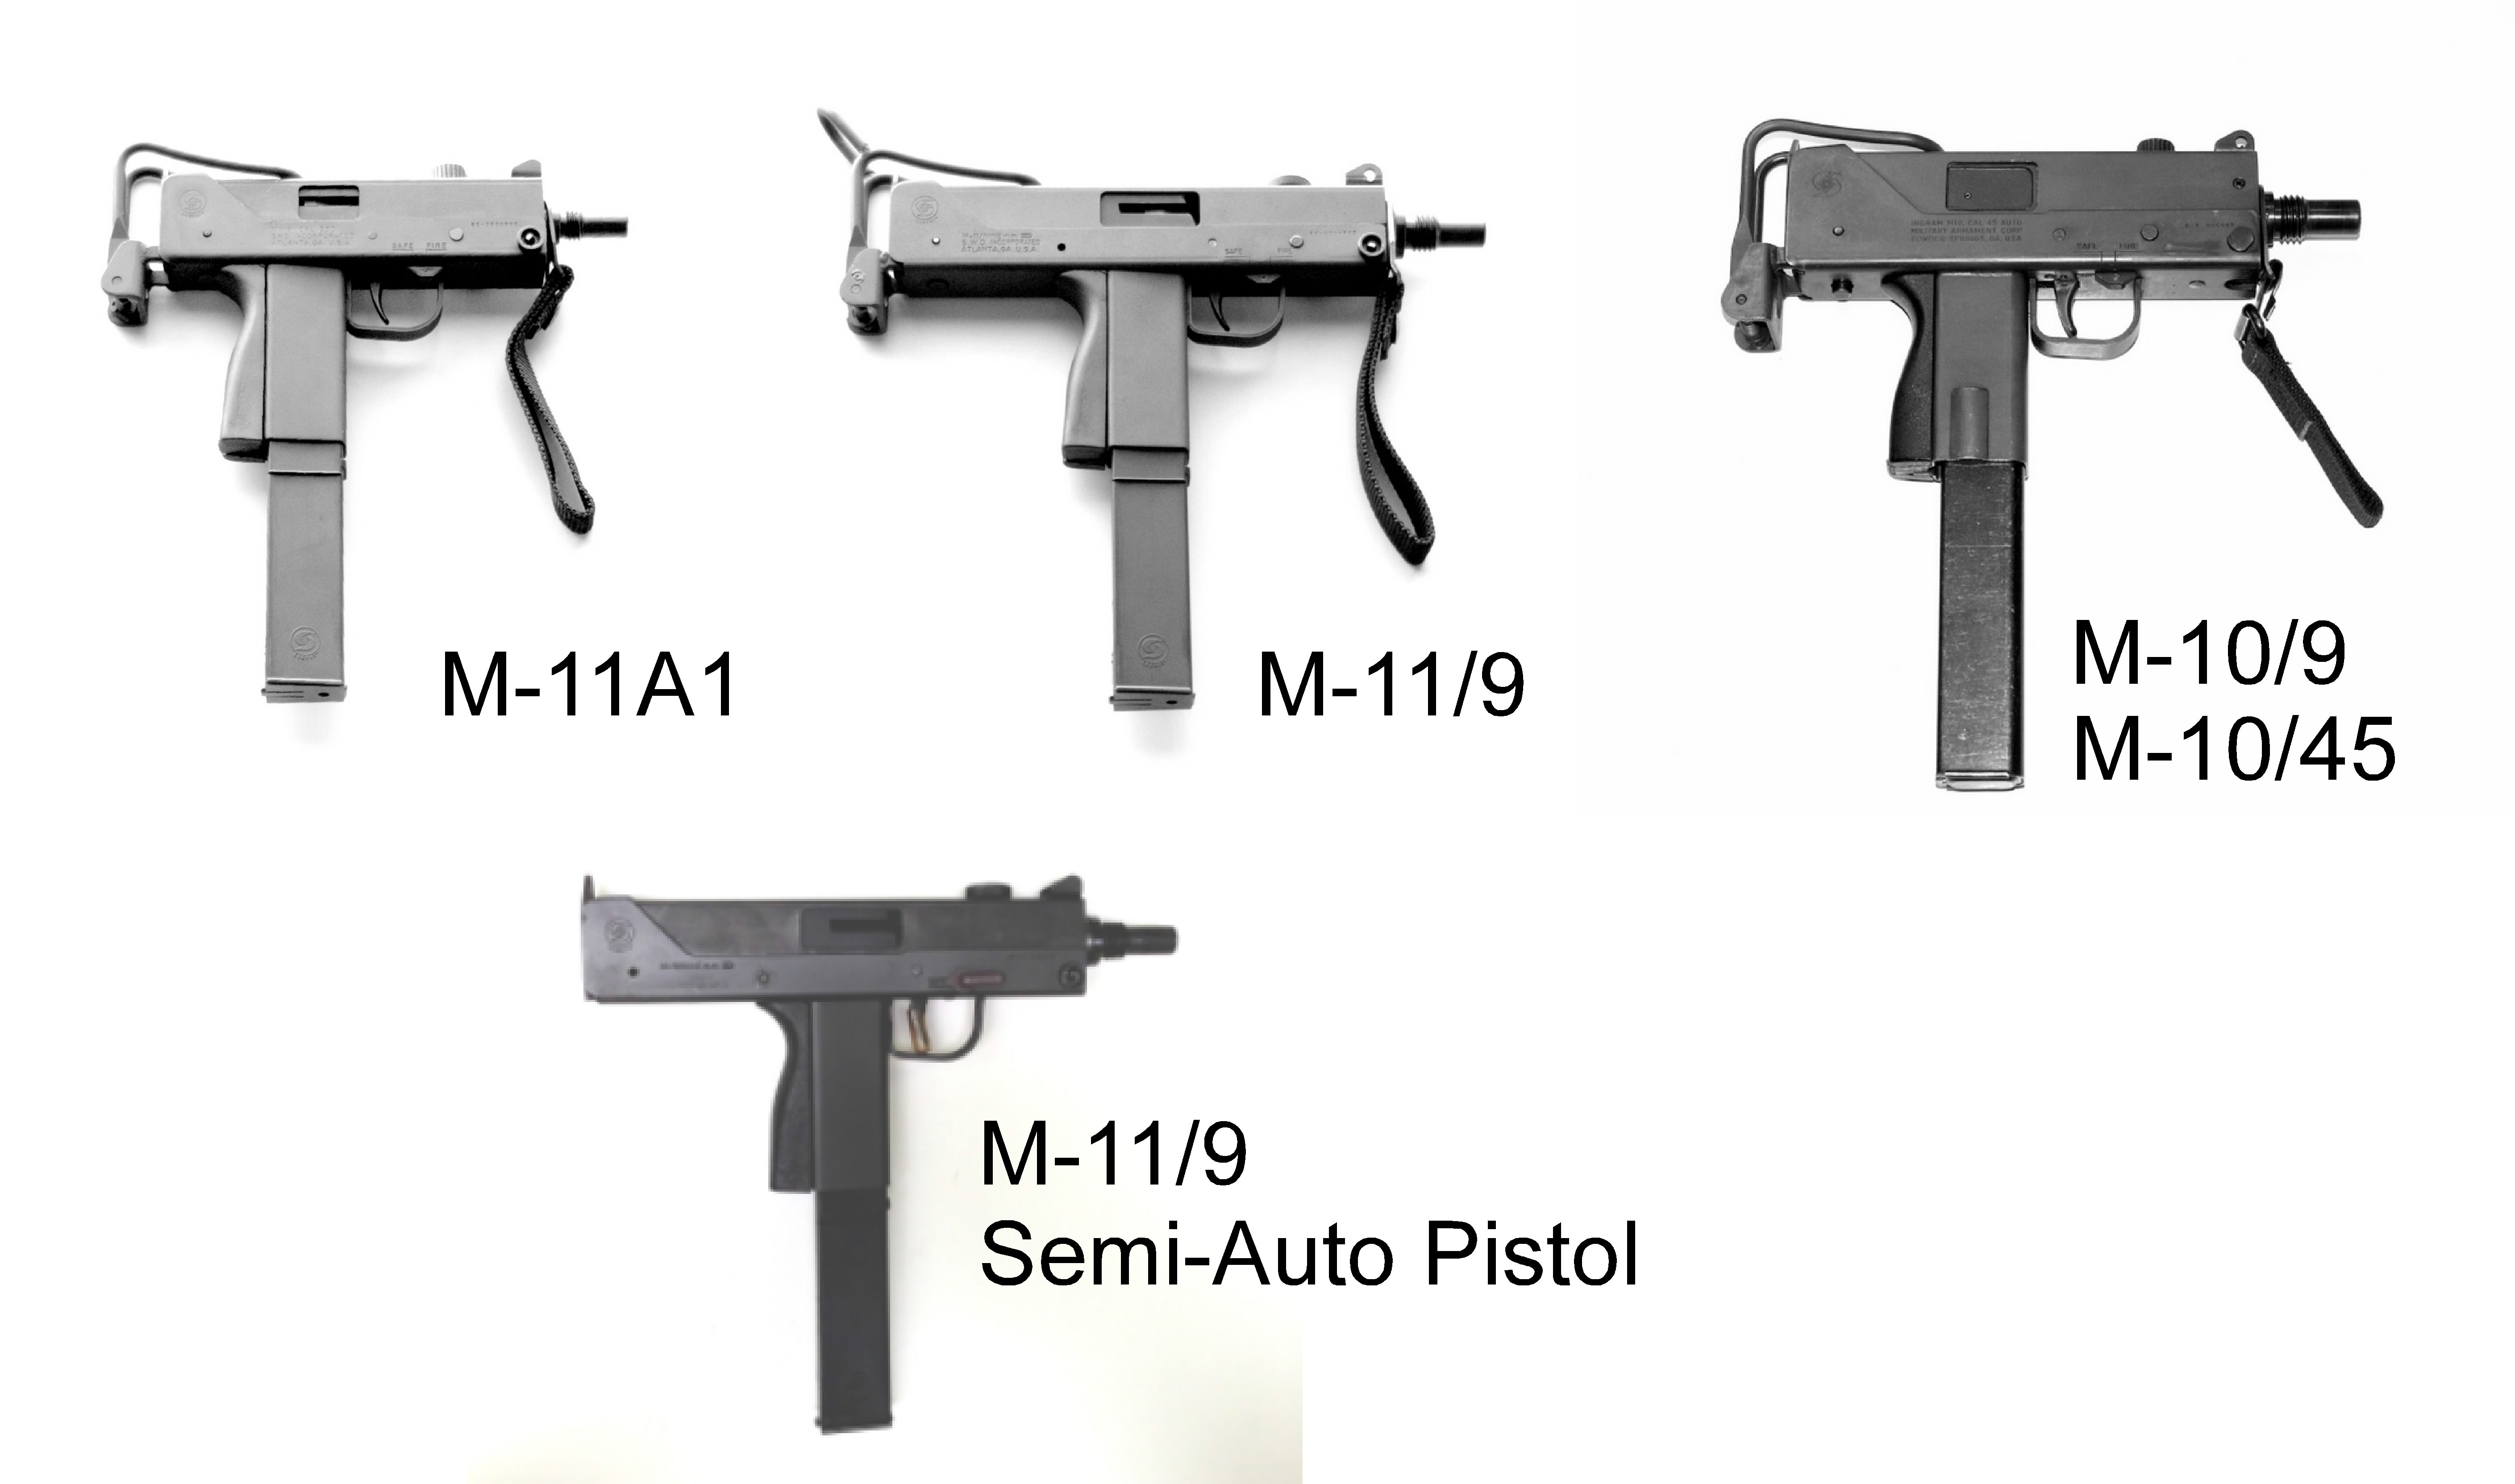 MAC-10 | Guns | Pinterest | Weapons and Mac